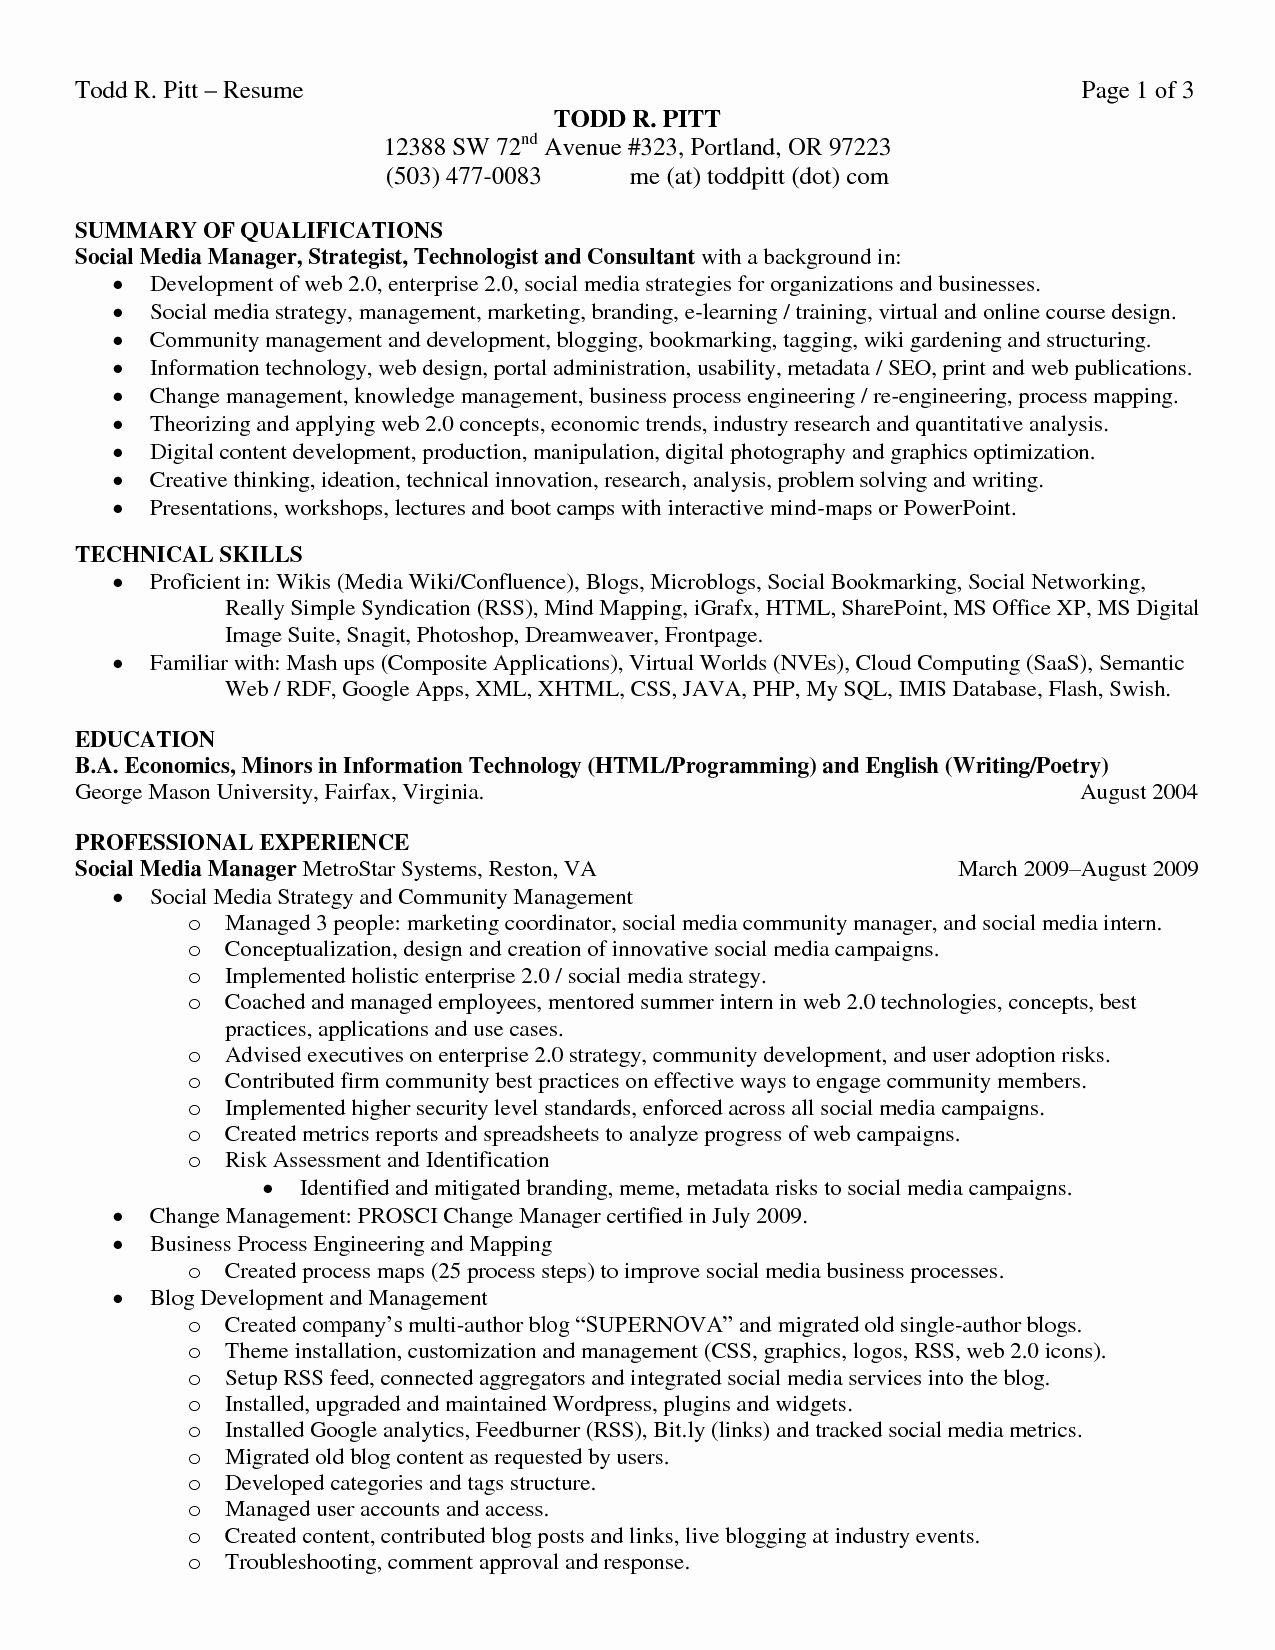 Example Resume Summary Statements Unique Best Summary Of